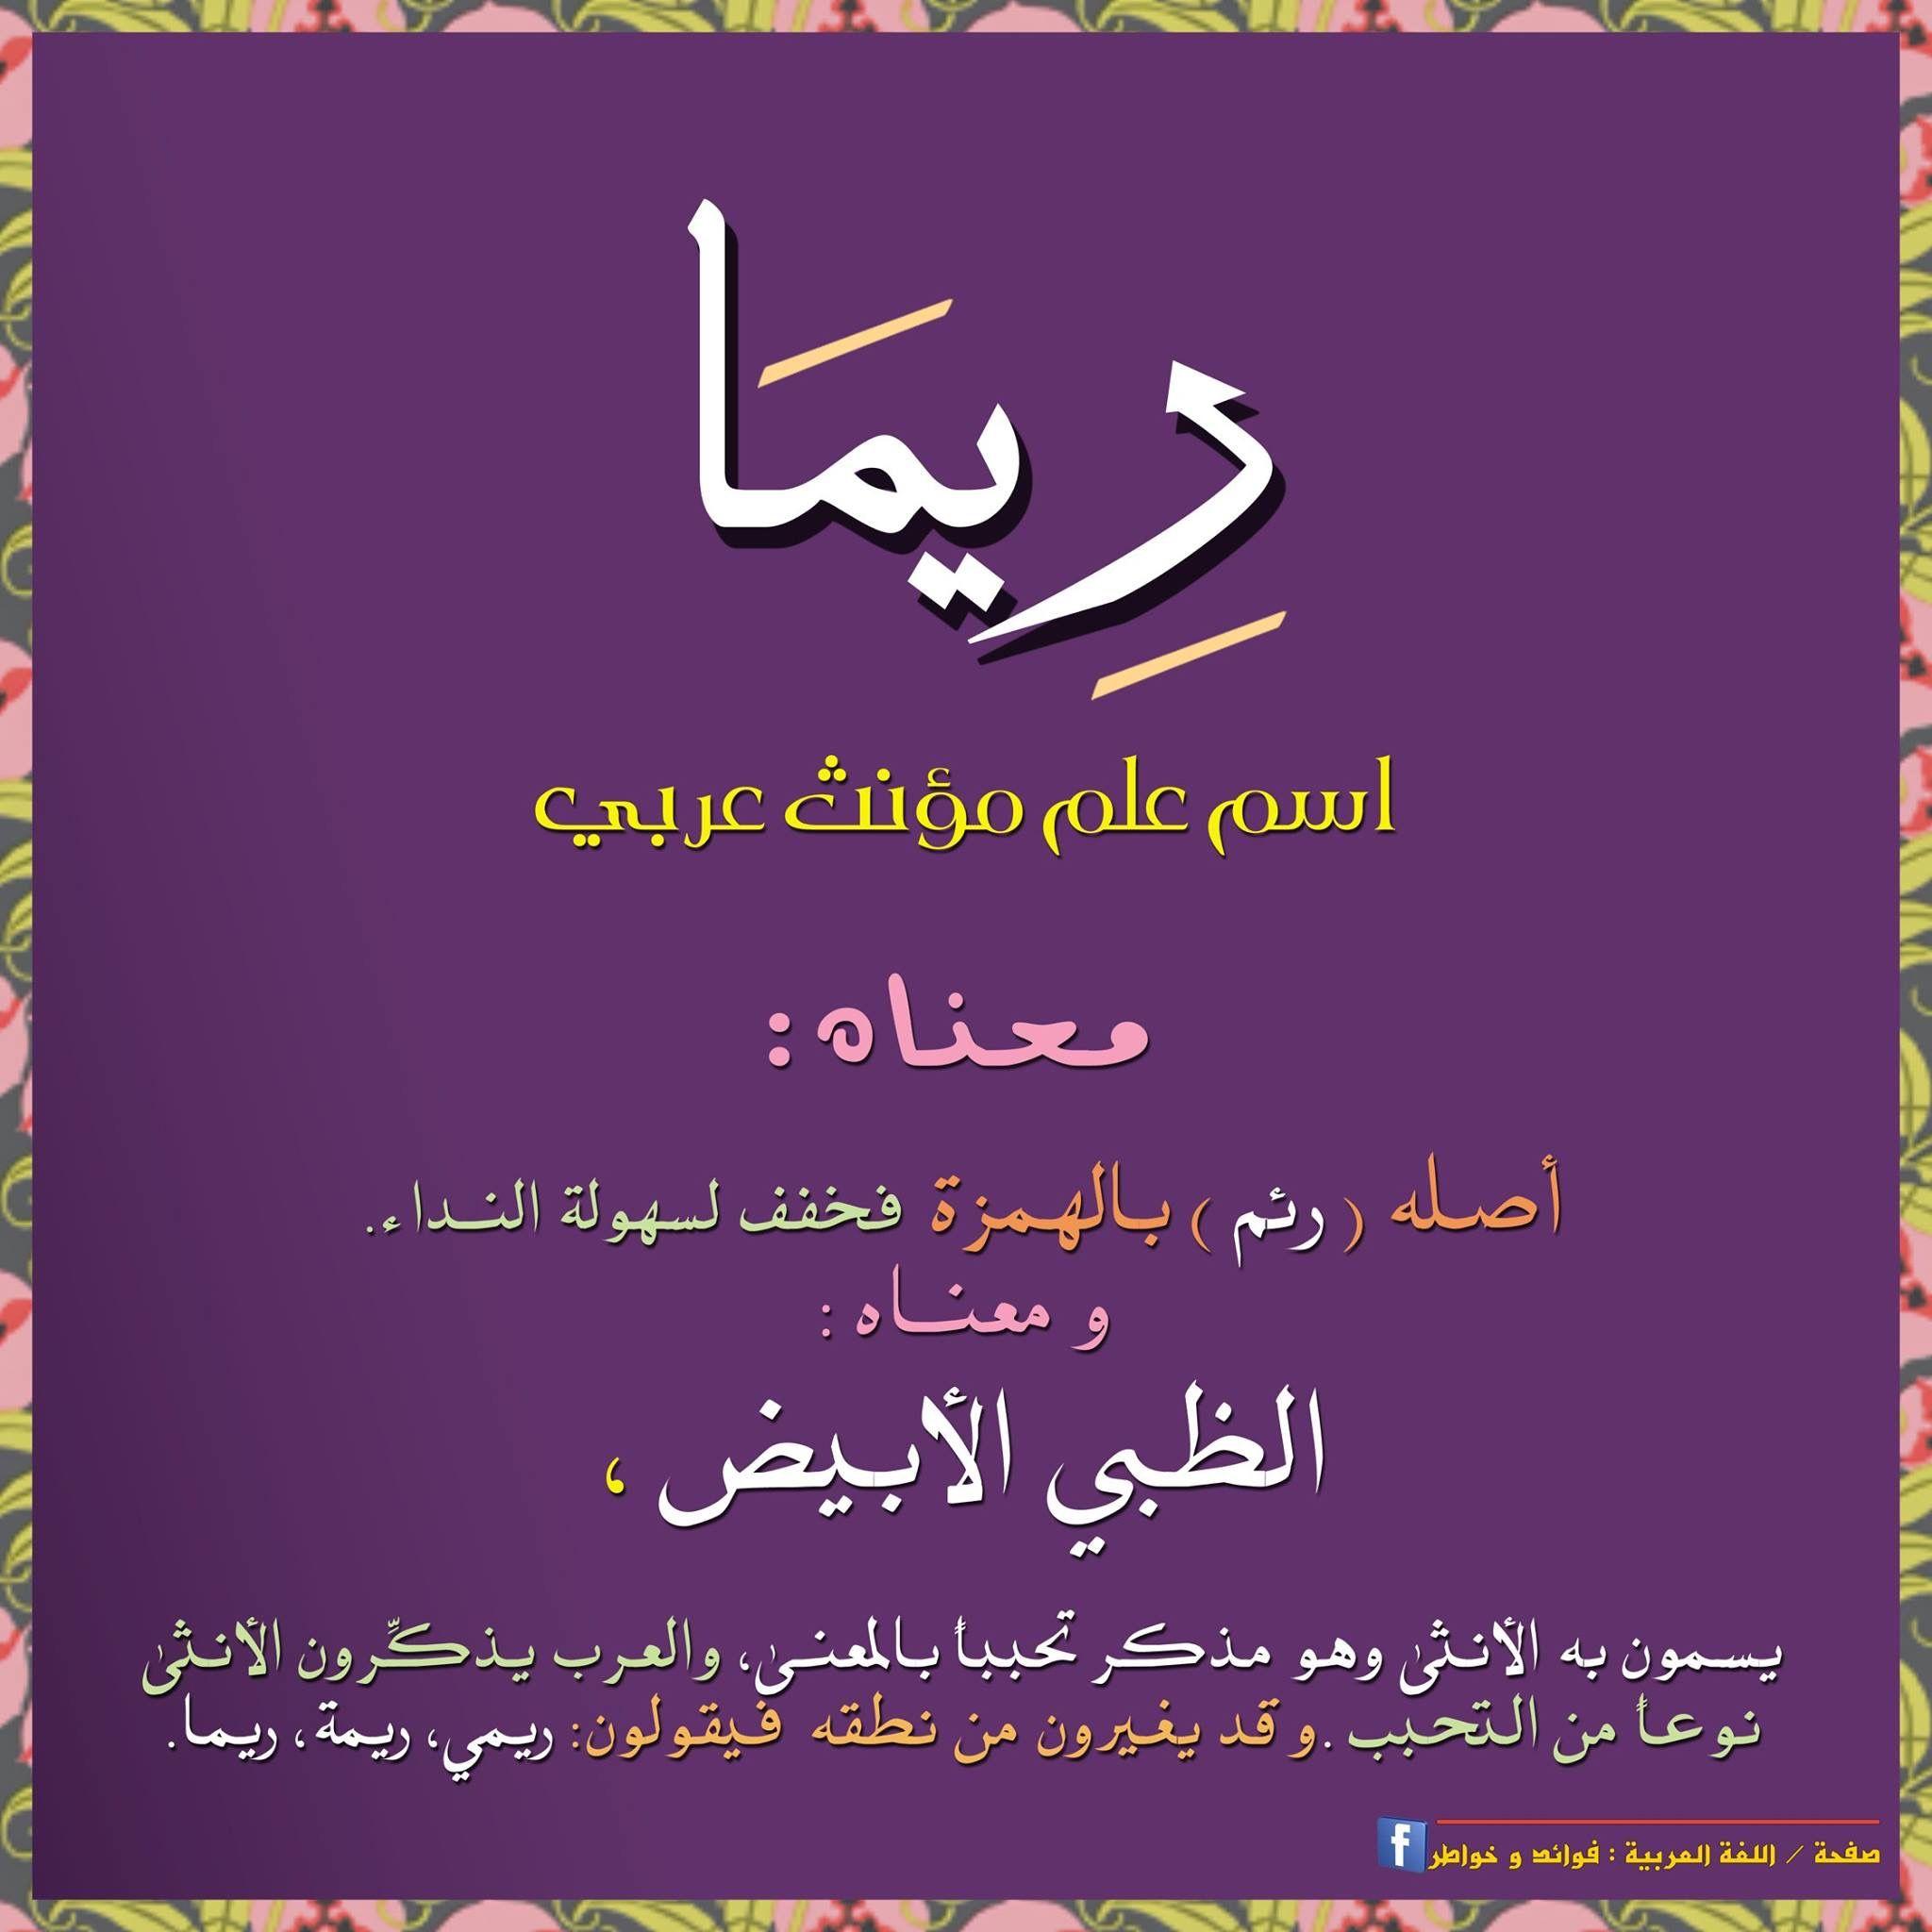 Pin By Khaled Bahnasawy On منوعة عربية Words Muslim Baby Names Arabic Baby Girl Names